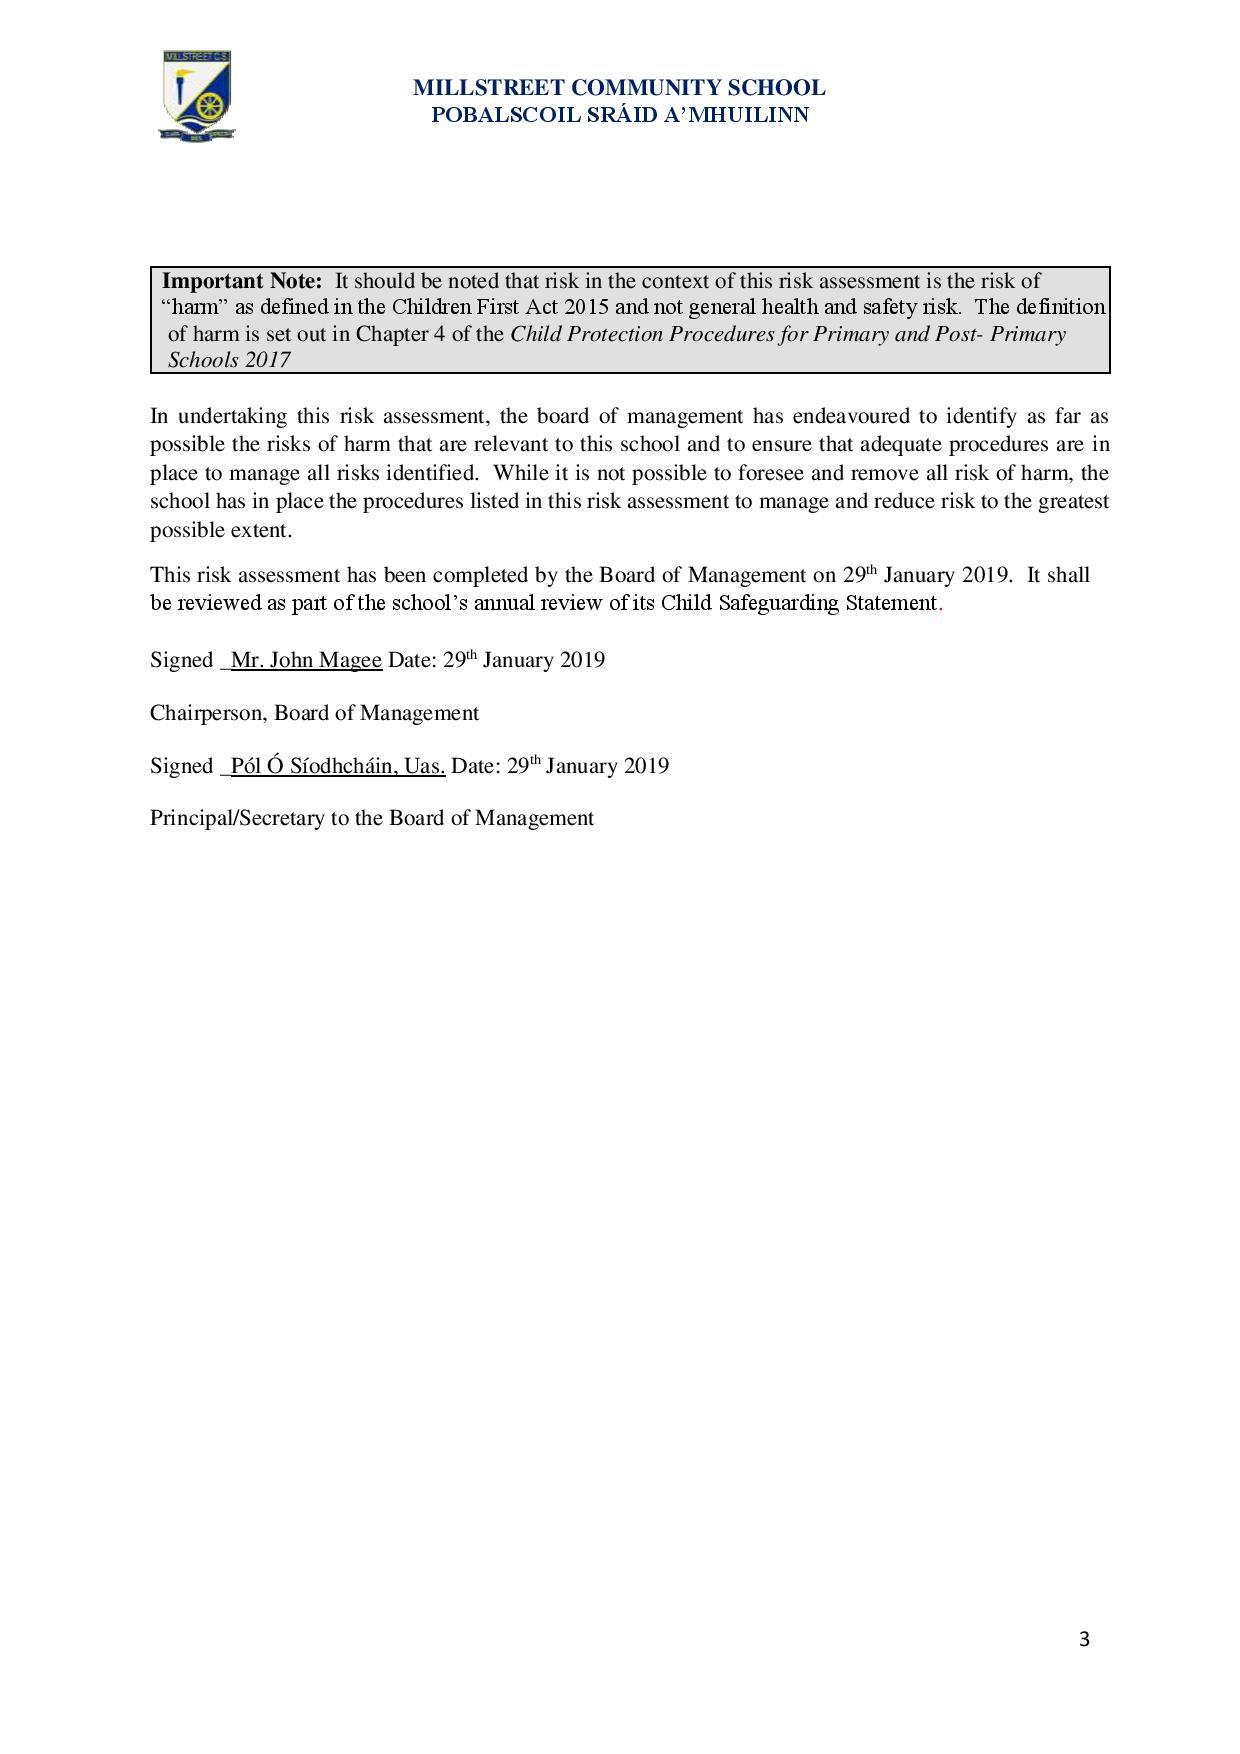 MCS Child Safeguarding Risk Assessment-page-003.jpg